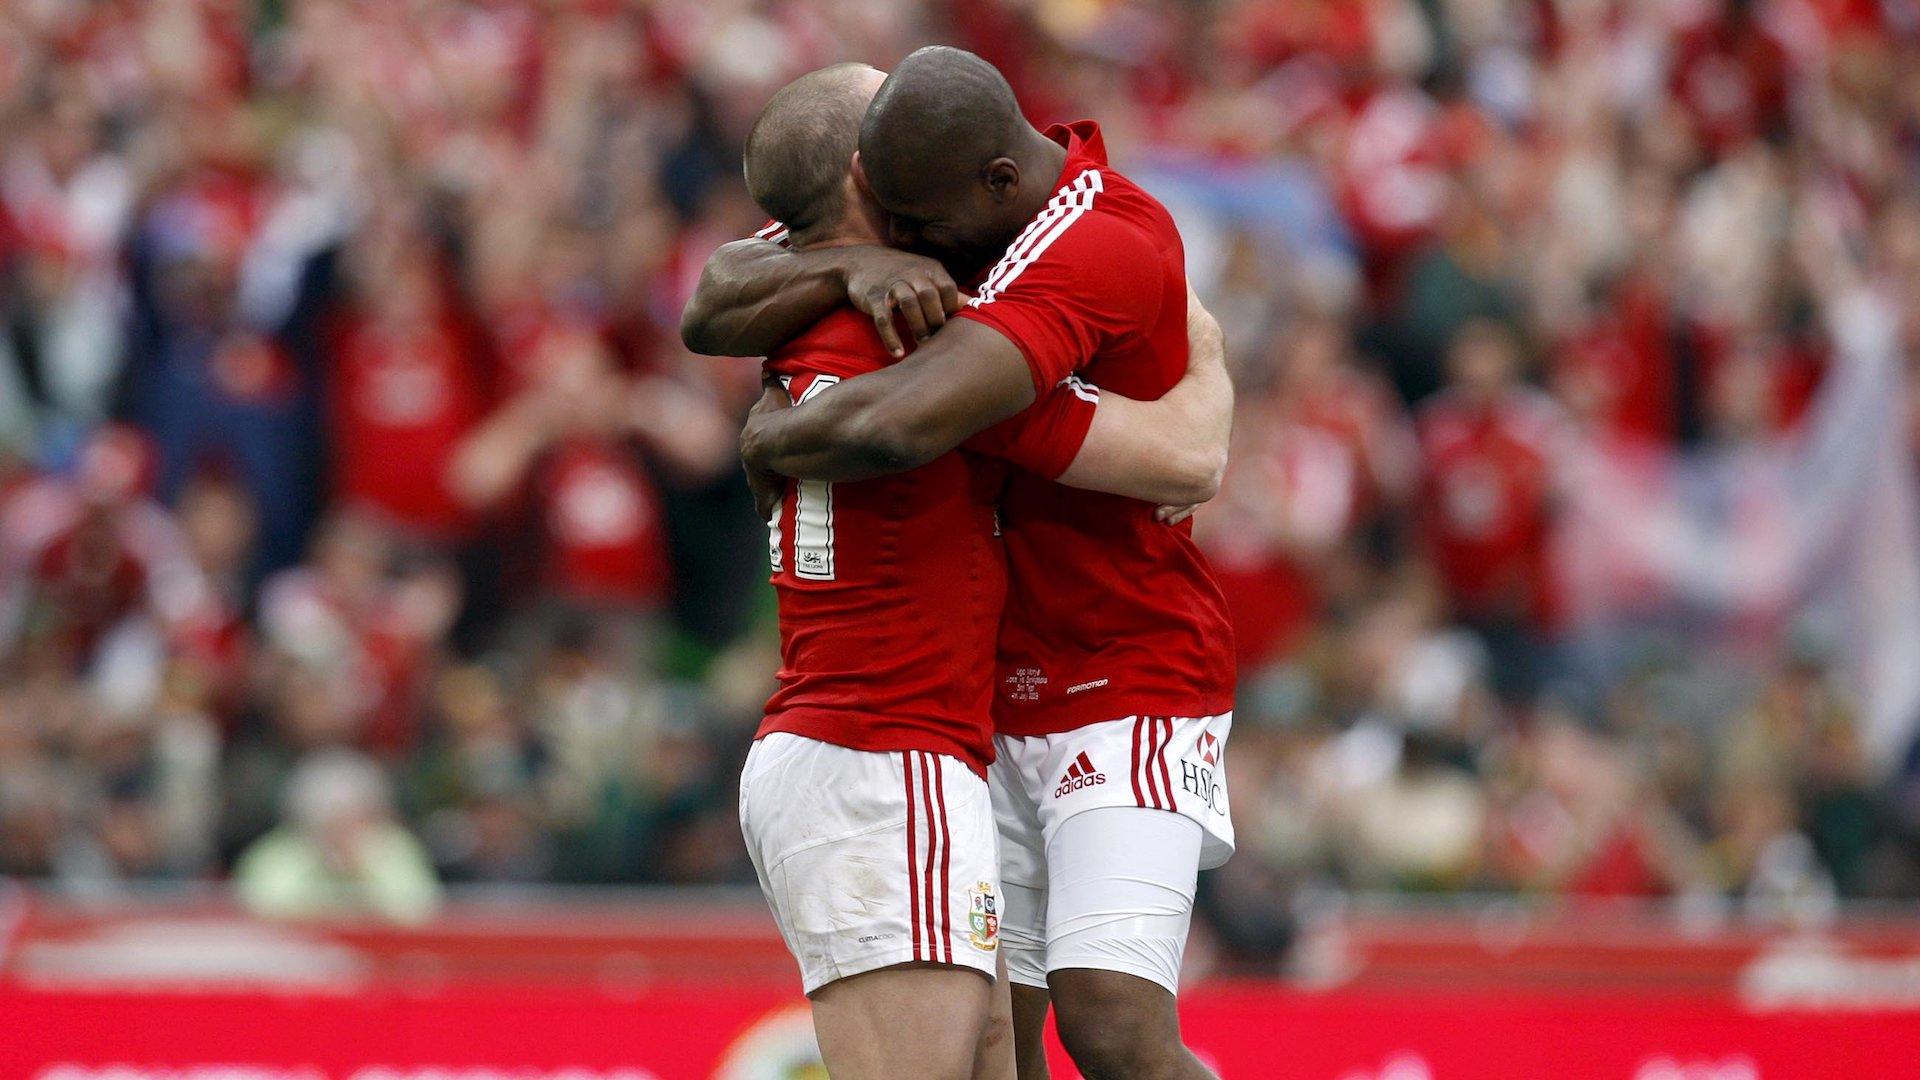 Shane Williams is congratlated by Ugo Monye